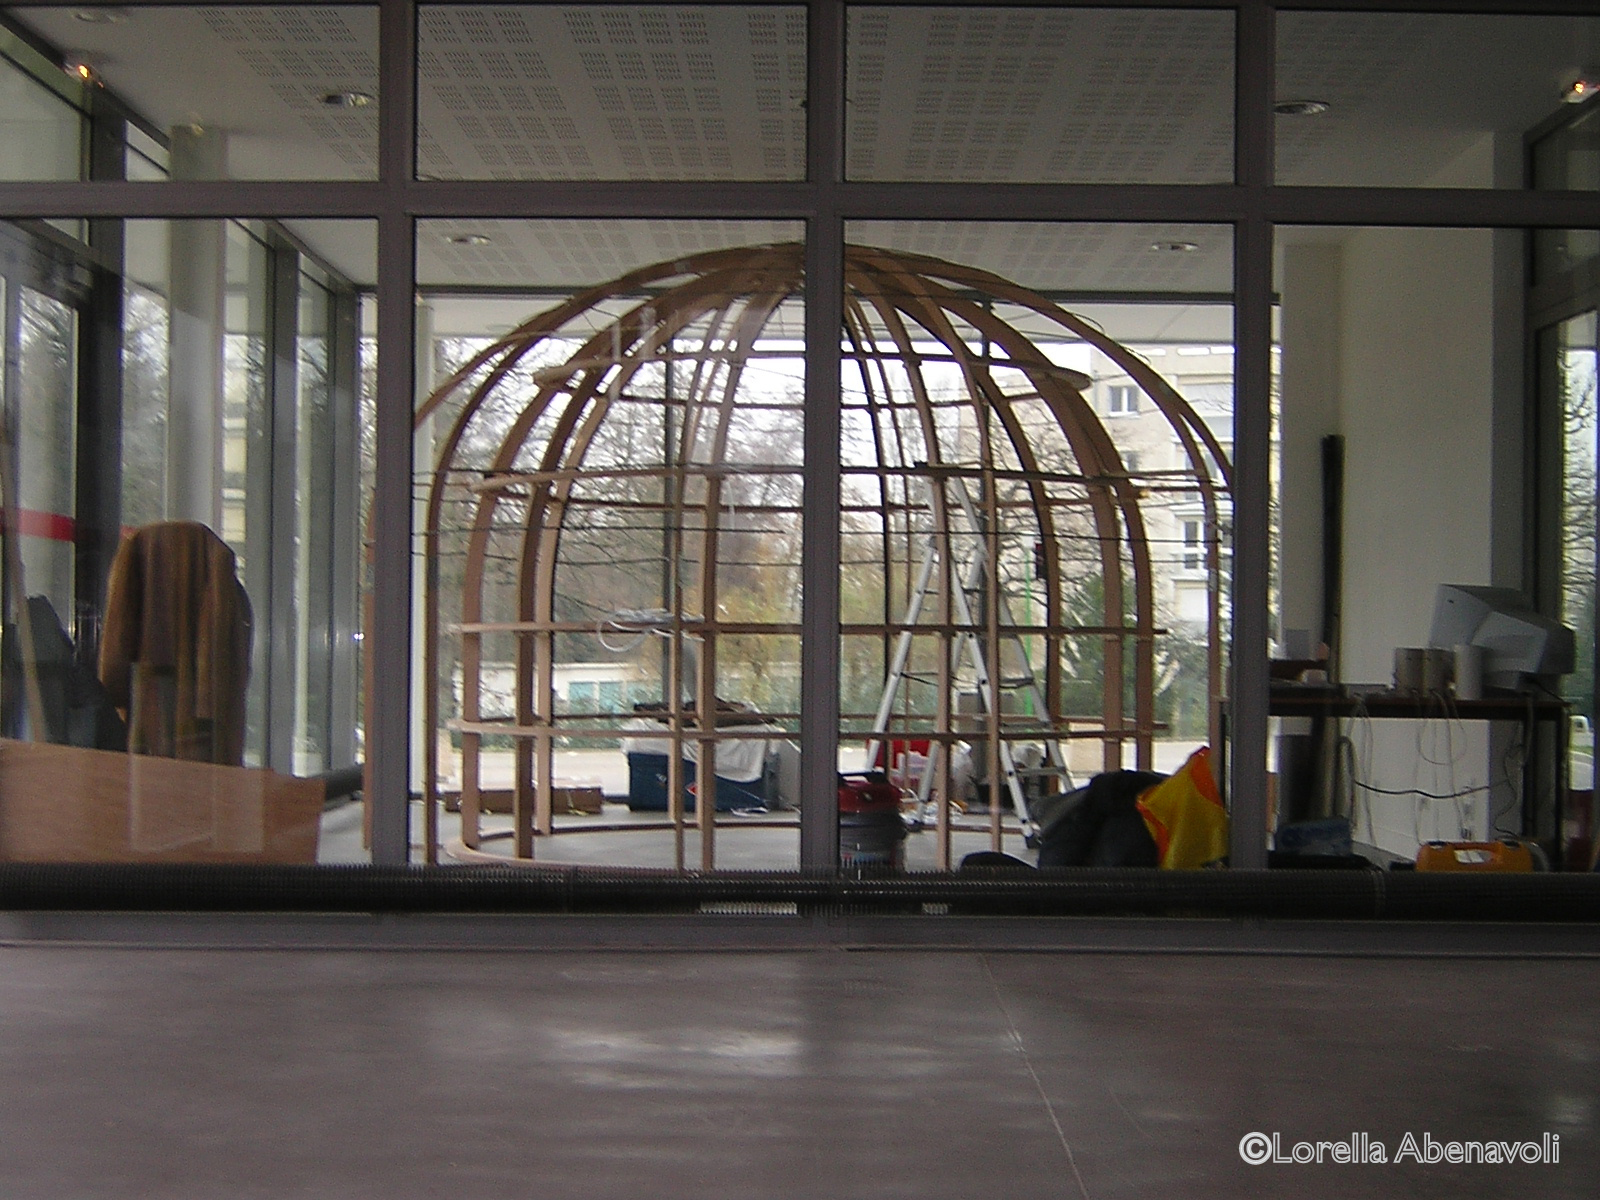 Le Souffle de la Terre, Étude n°6, installation, Lorella Abenavoli. Montage, structure dôme, Le Diapason, 2006. Photo: ©Lorella Abenavoli